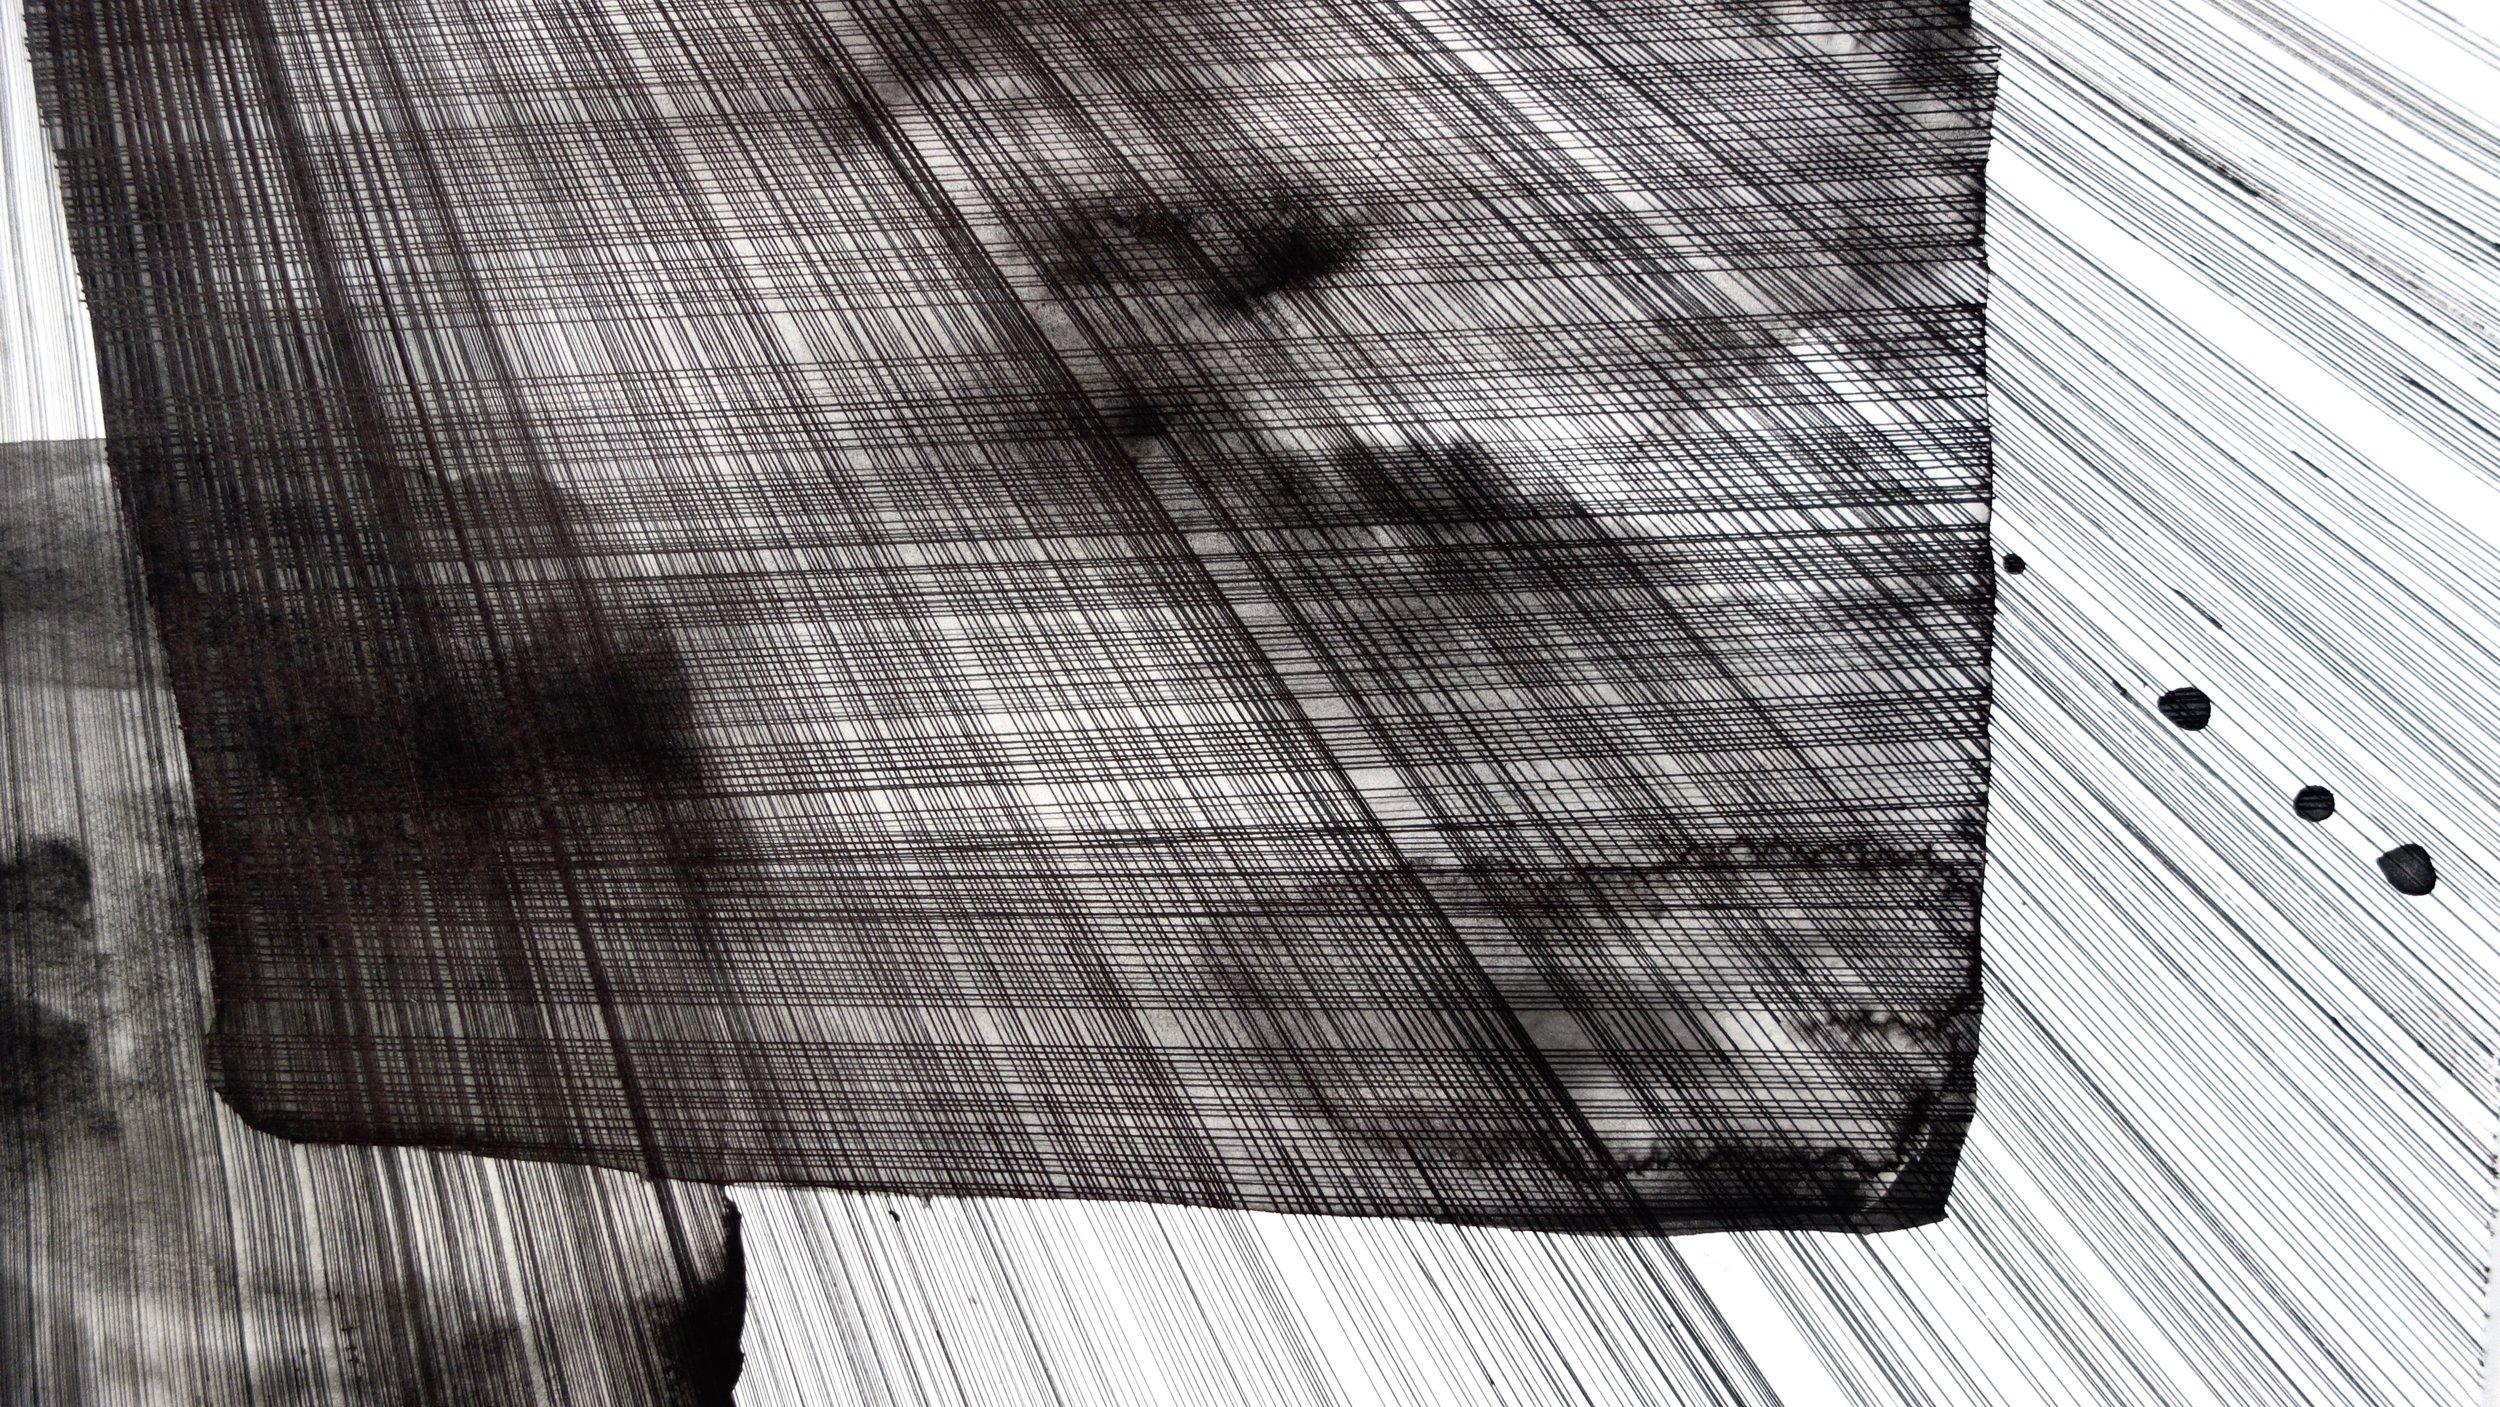 Prism detail ©kellycorrell